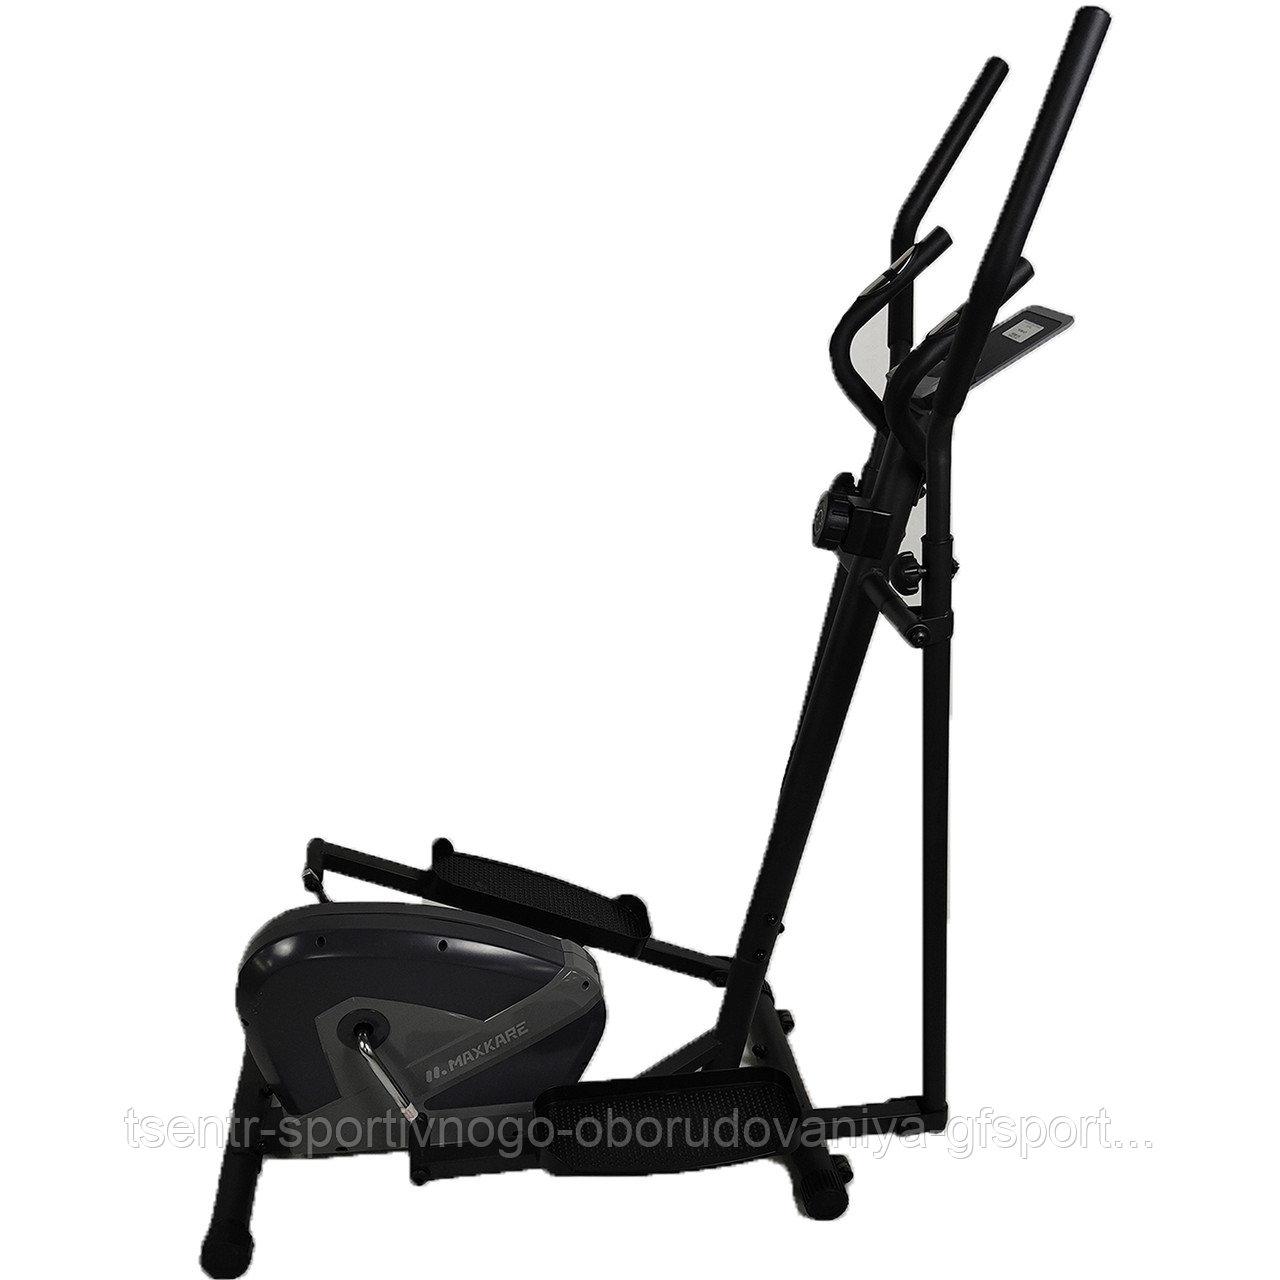 Эллиптический тренажер GF-WK01